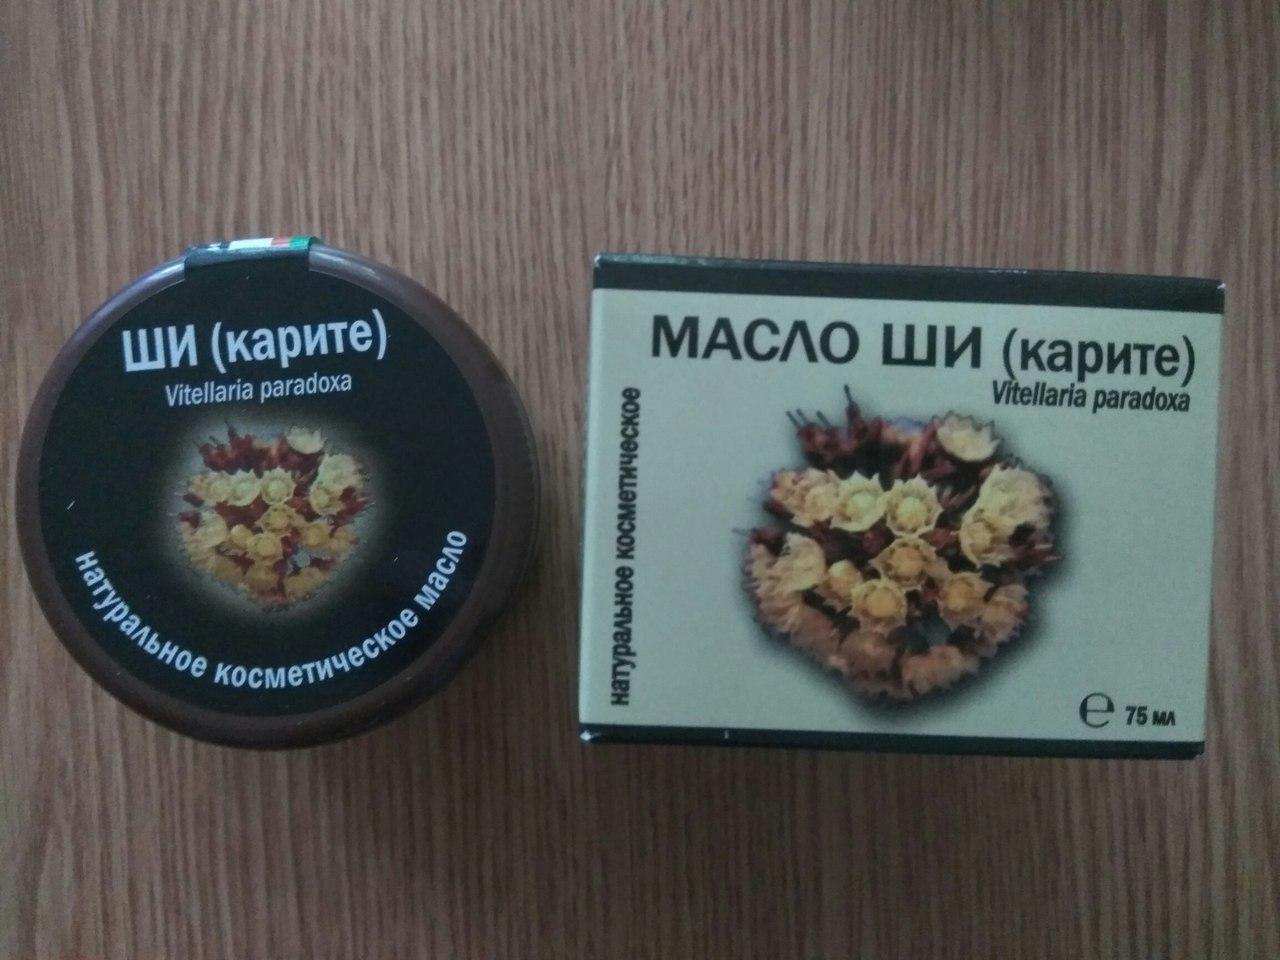 Косметическое масло ШИ (Карите) ООО «Весна». Отзыв